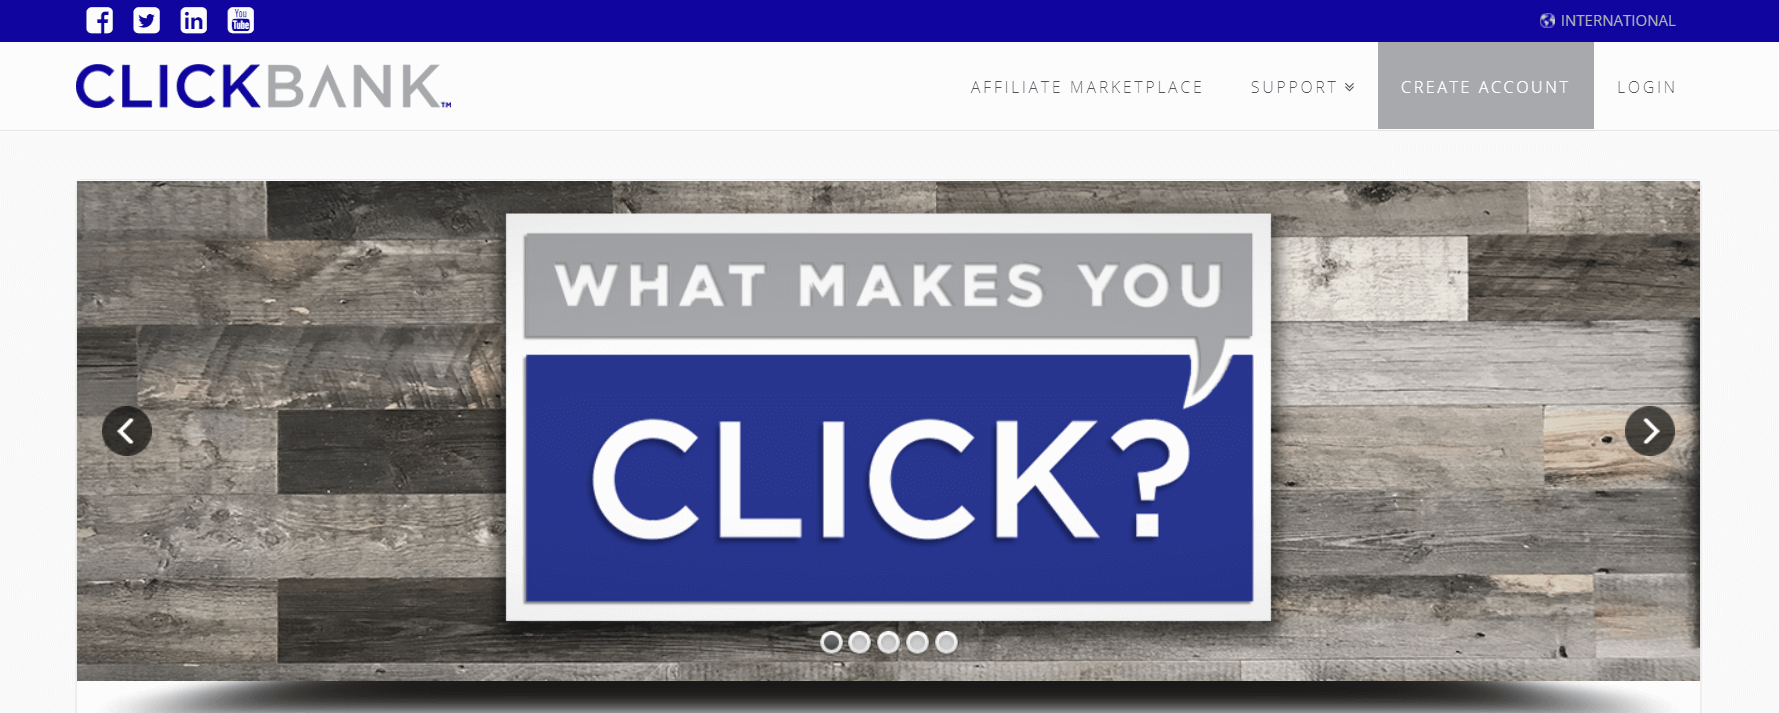 The ClickBank website.